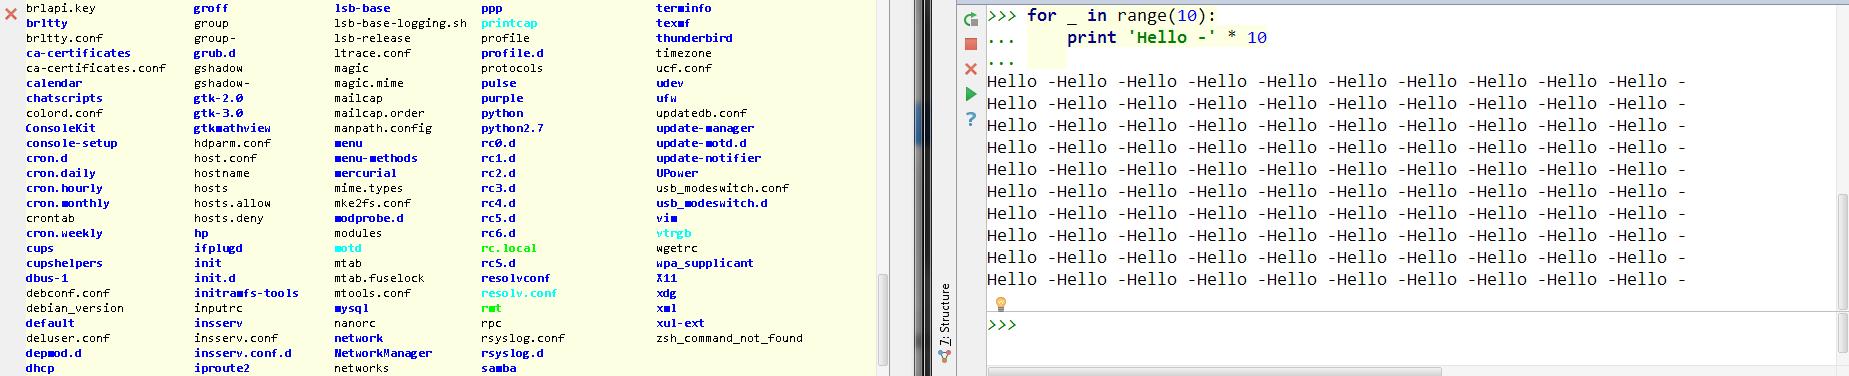 Pycharm 2 7 SSH Terminal Font – IDEs Support (IntelliJ Platform